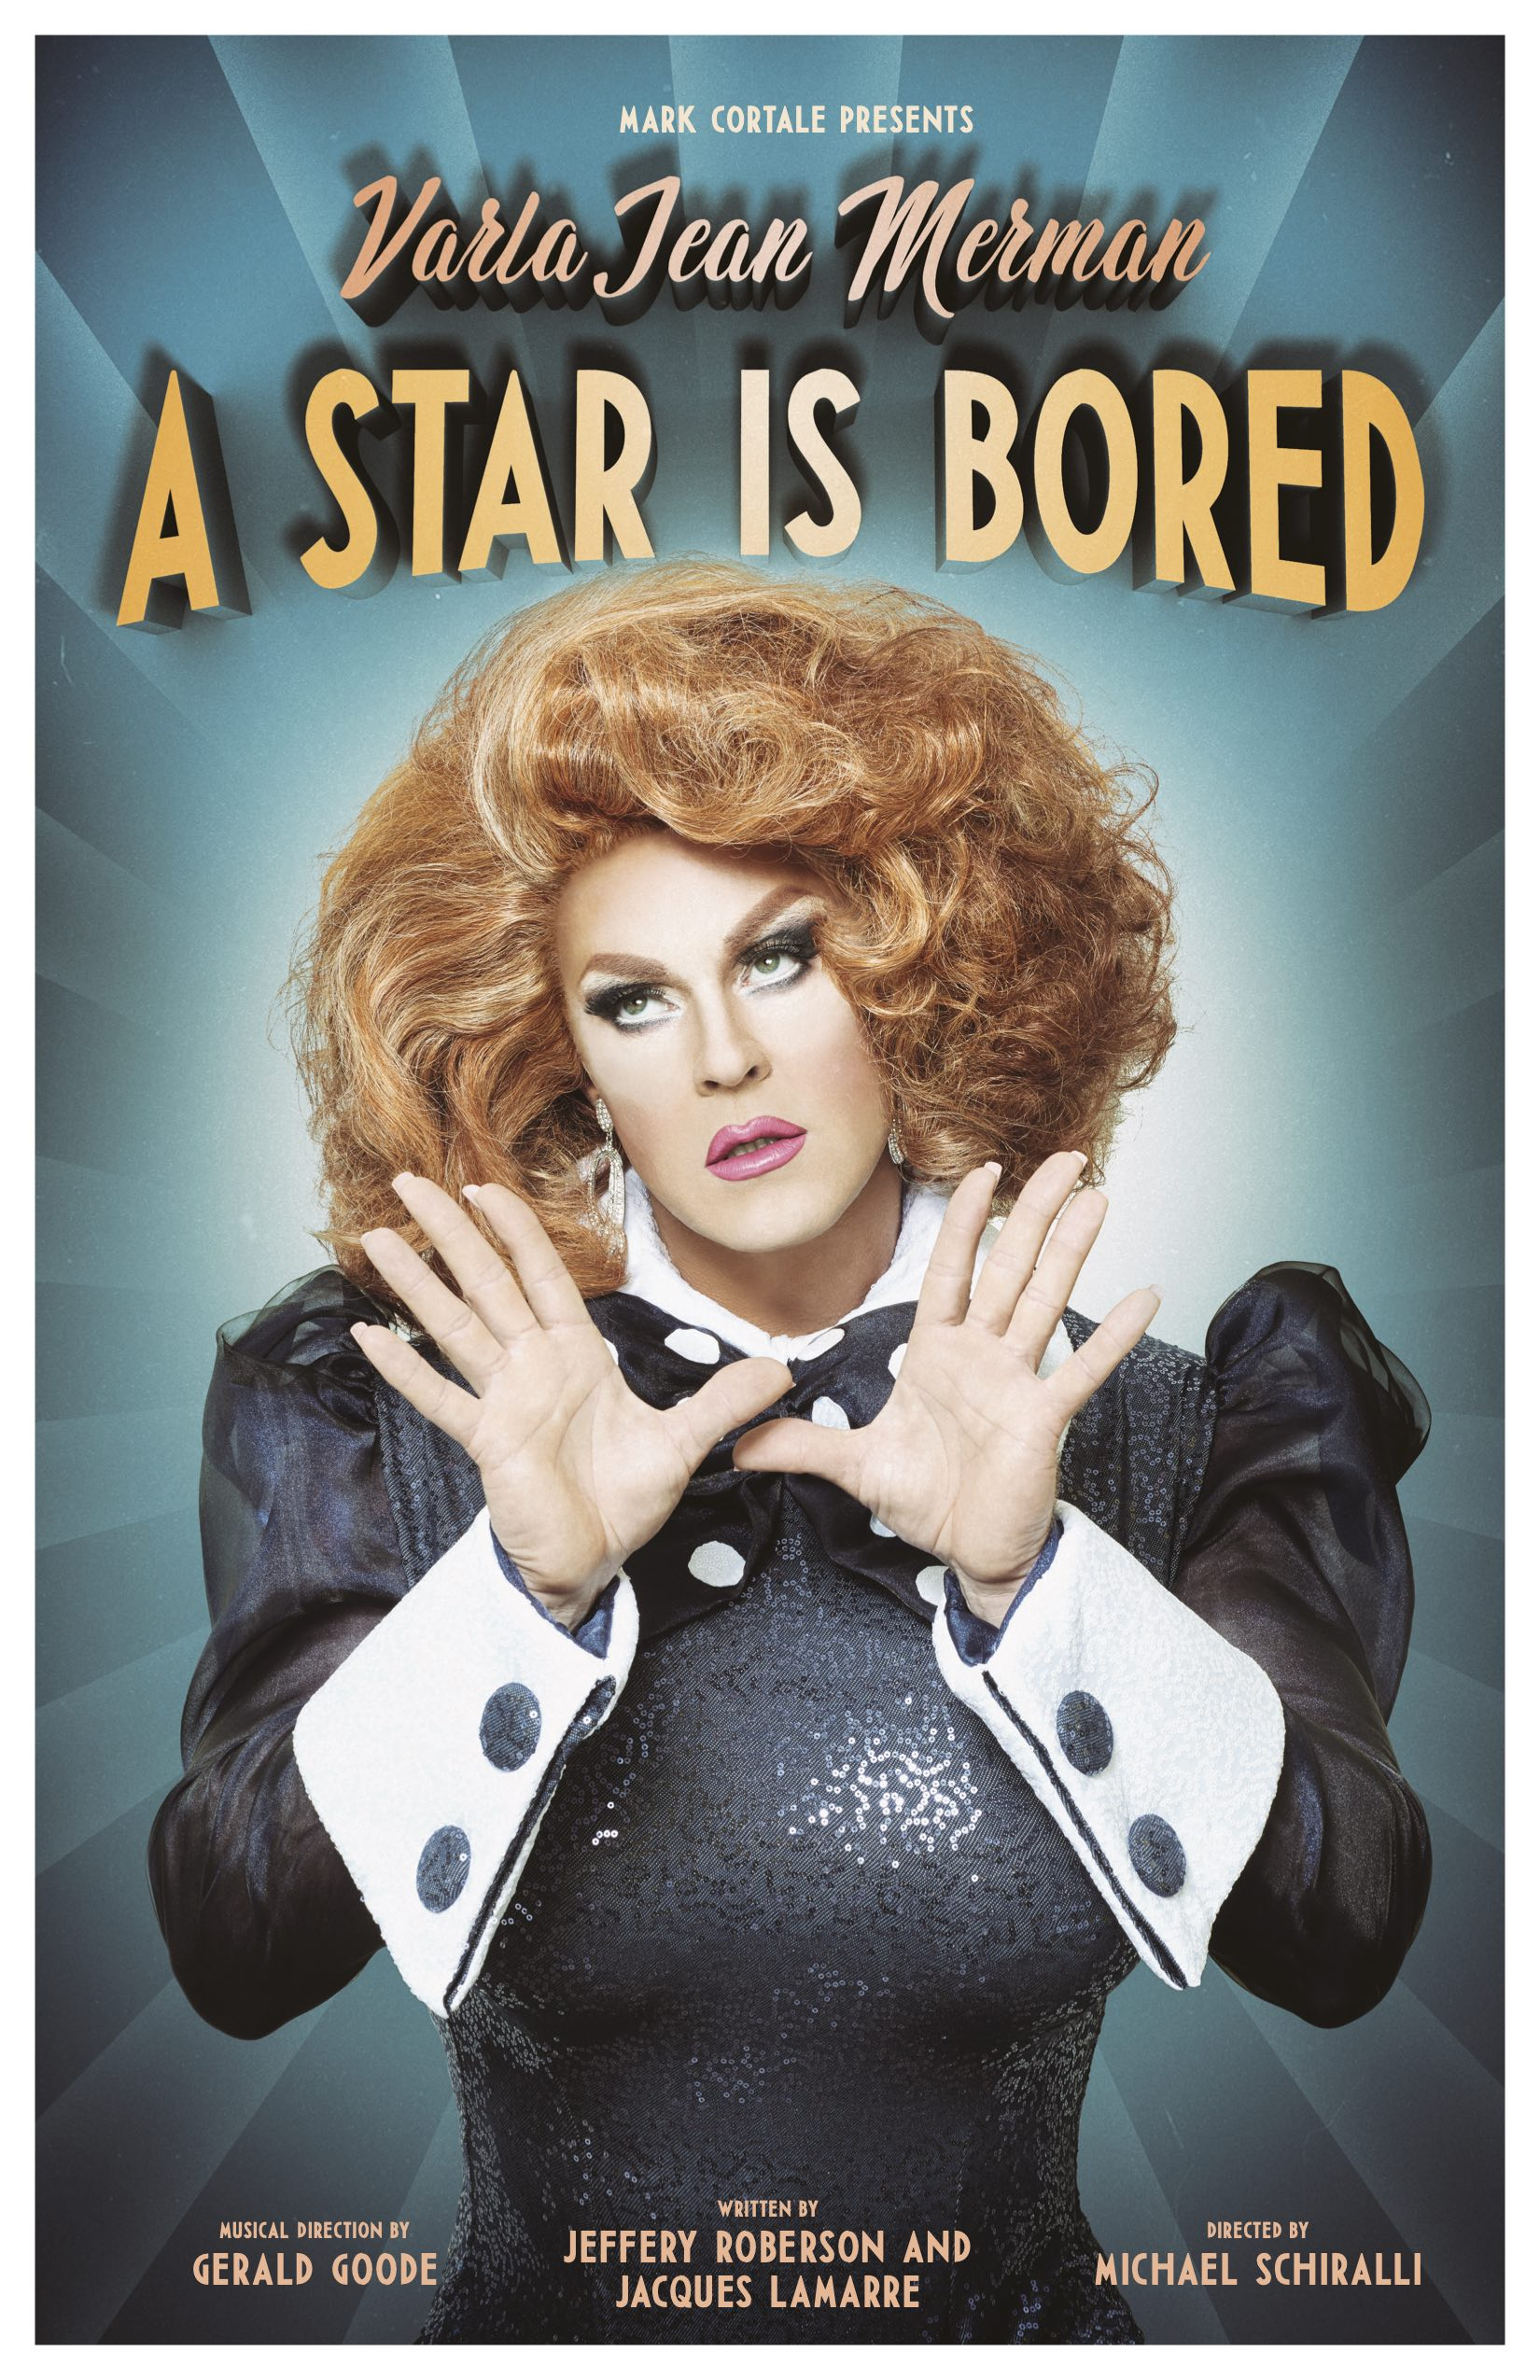 VARLA JEAN MERMAN in  A STAR IS BORED (POSTPONED TBA)